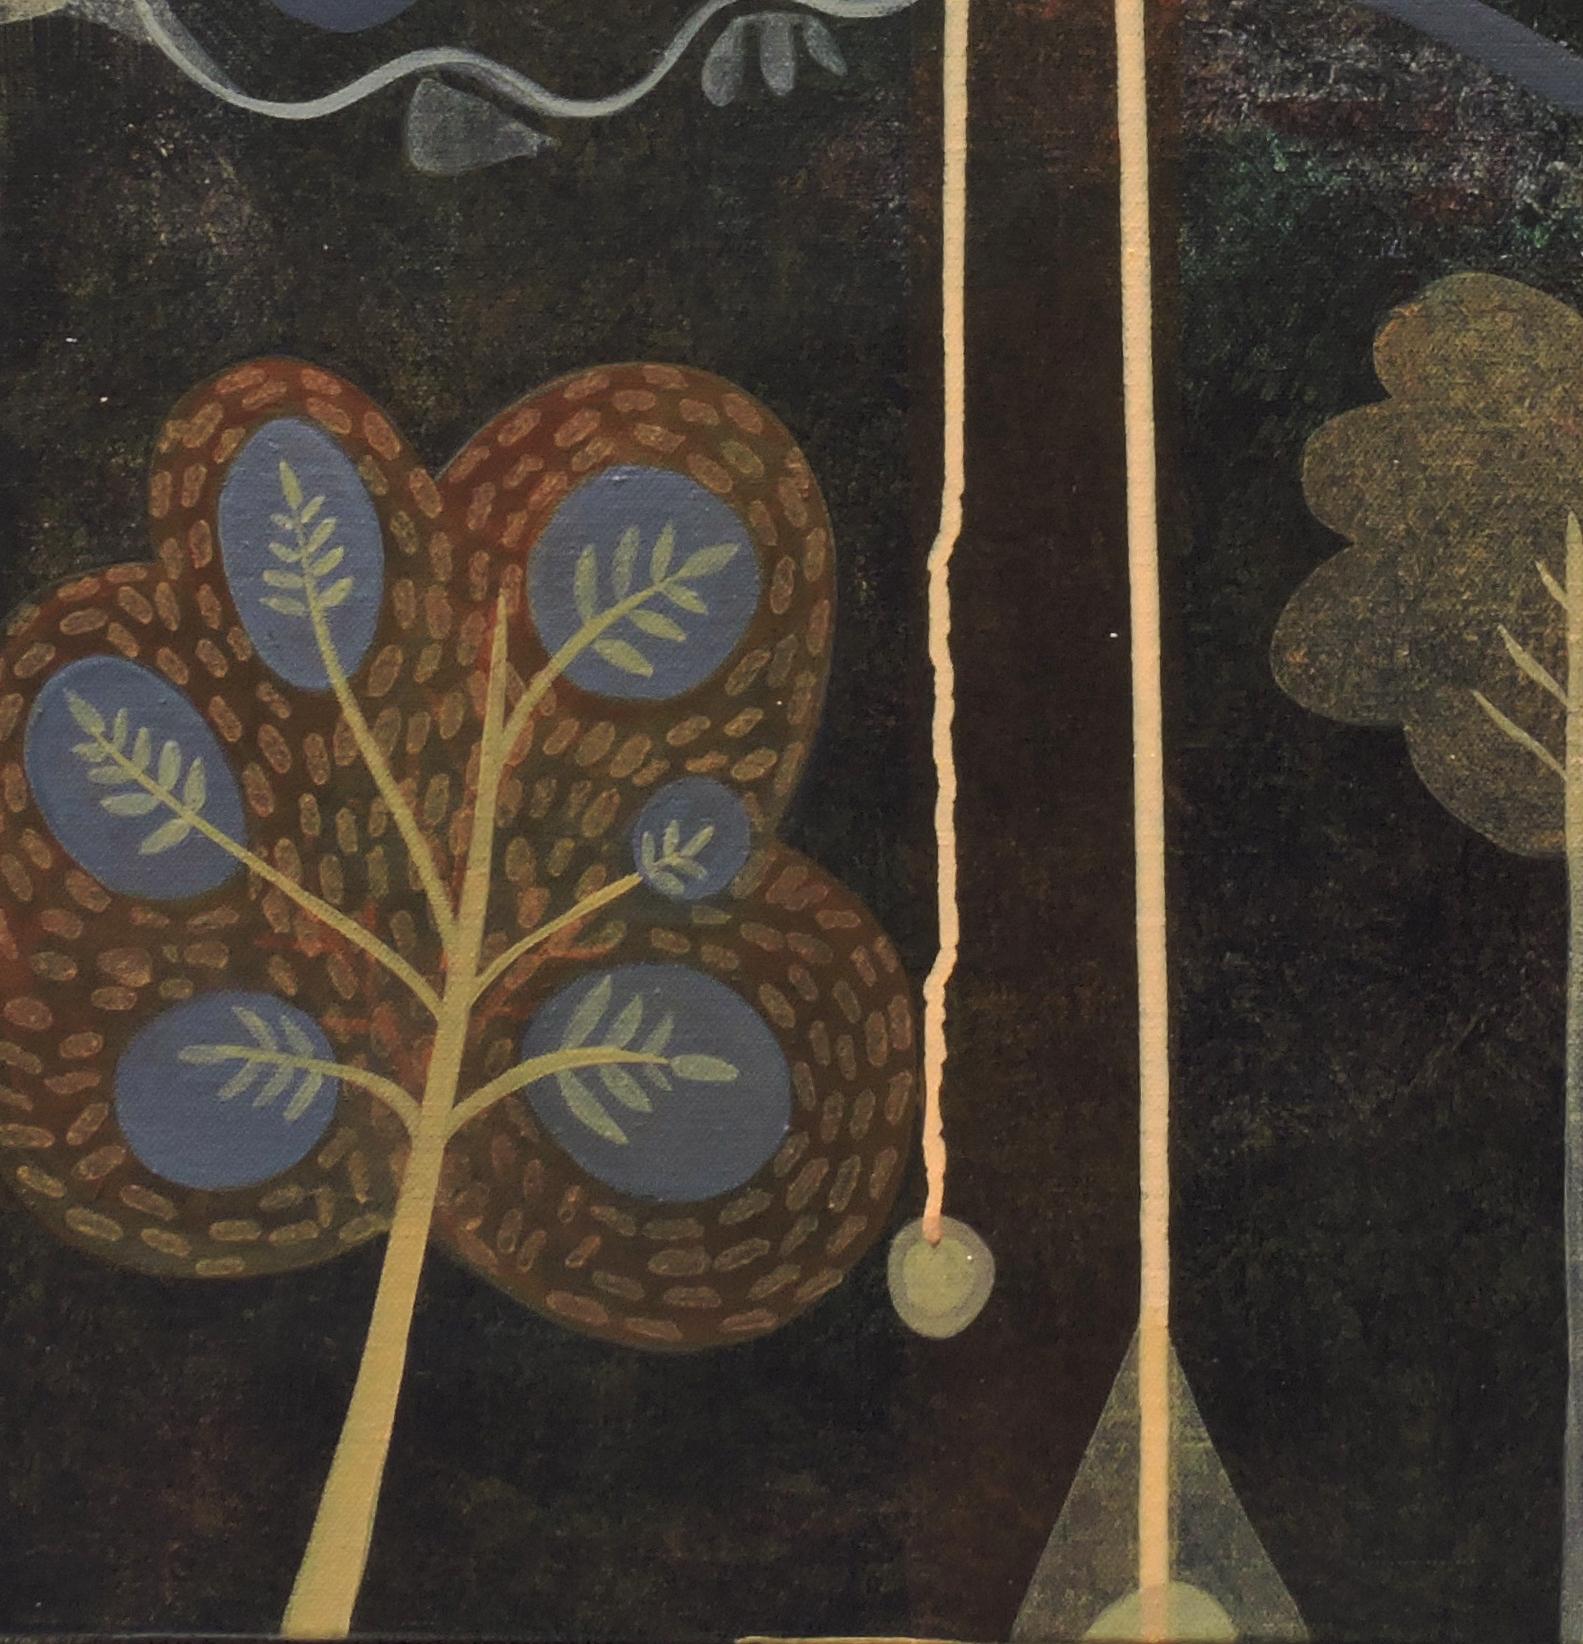 S213 Close-up Detail (Bottom Left)